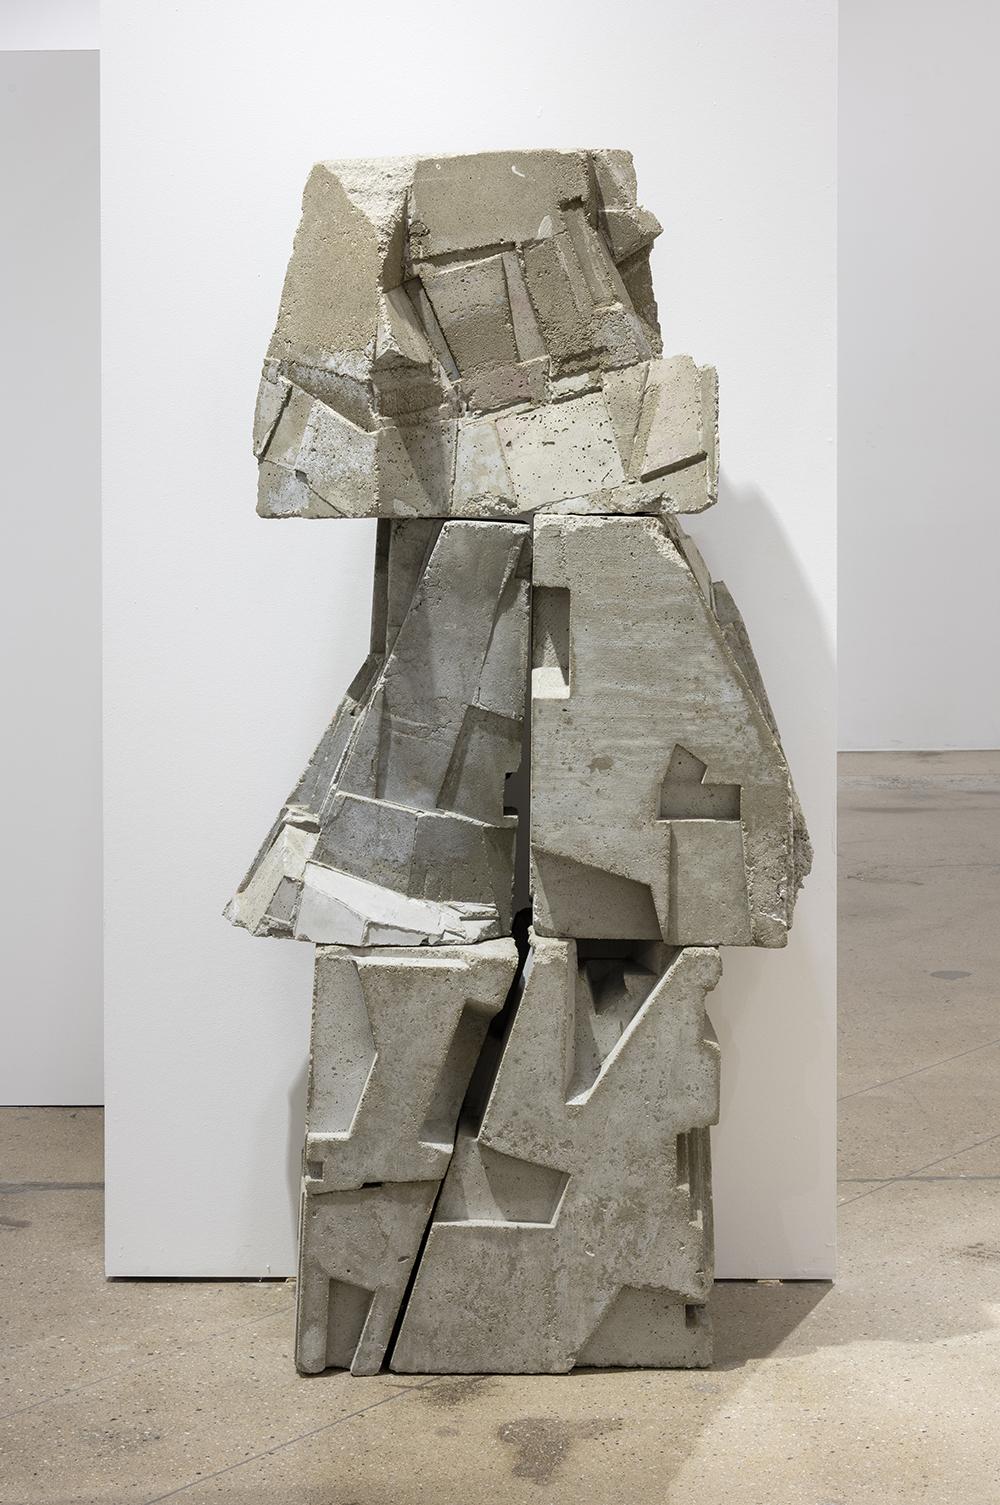 Gustavo Godoy.  <em>Vacant Marker</em>, 2017. Cast concrete, 66 x 28 1/2 x 12 inches (167.6 x 72.4 x 30.5 cm)